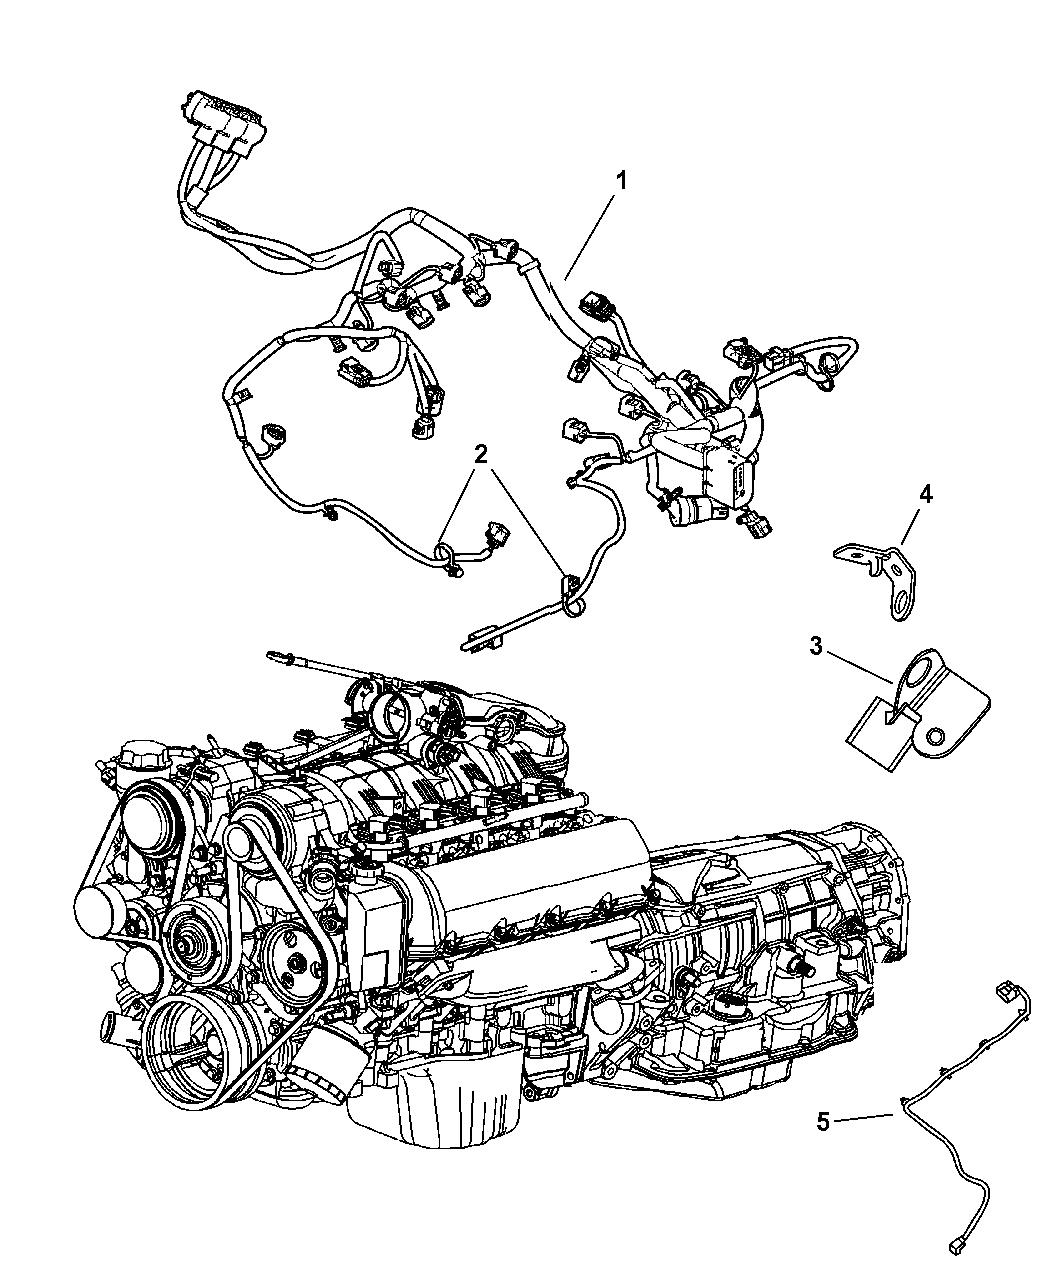 2009 jeep grand cherokee wiring - engine - thumbnail 1